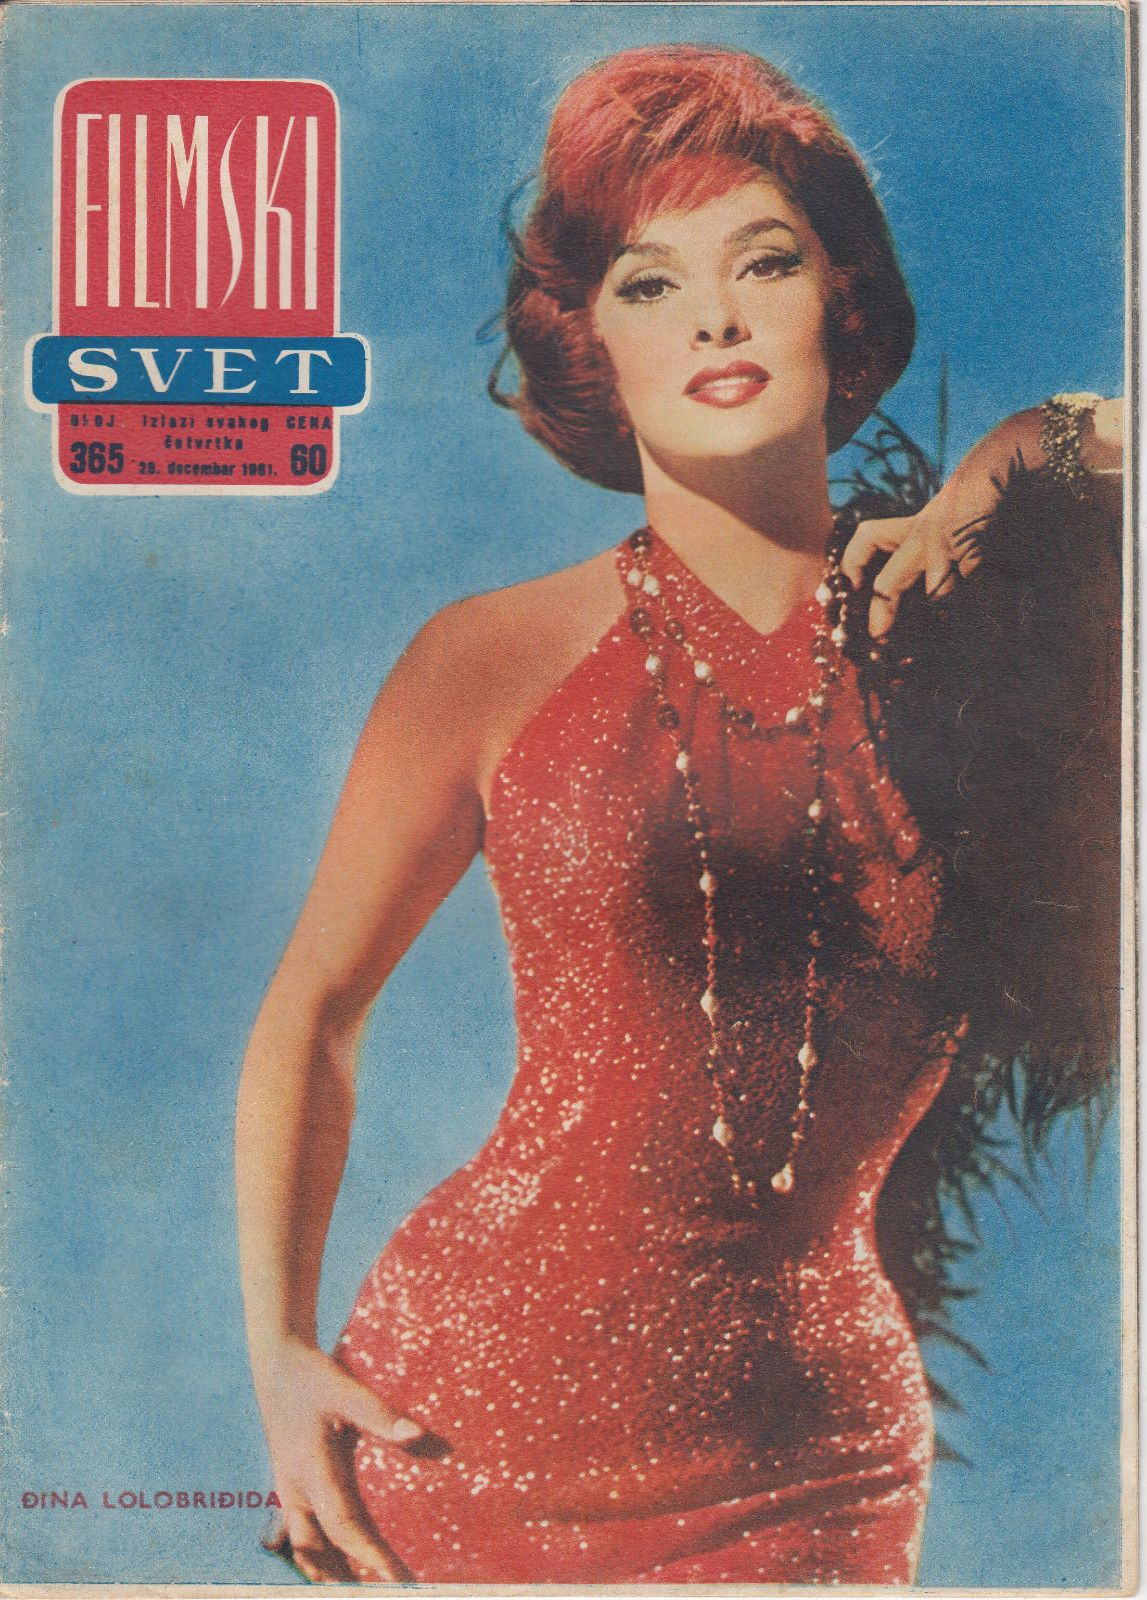 Gina Lollobrigida Gregory Peck Filmski Svet Movie Magazine Yugoslavia | eBay